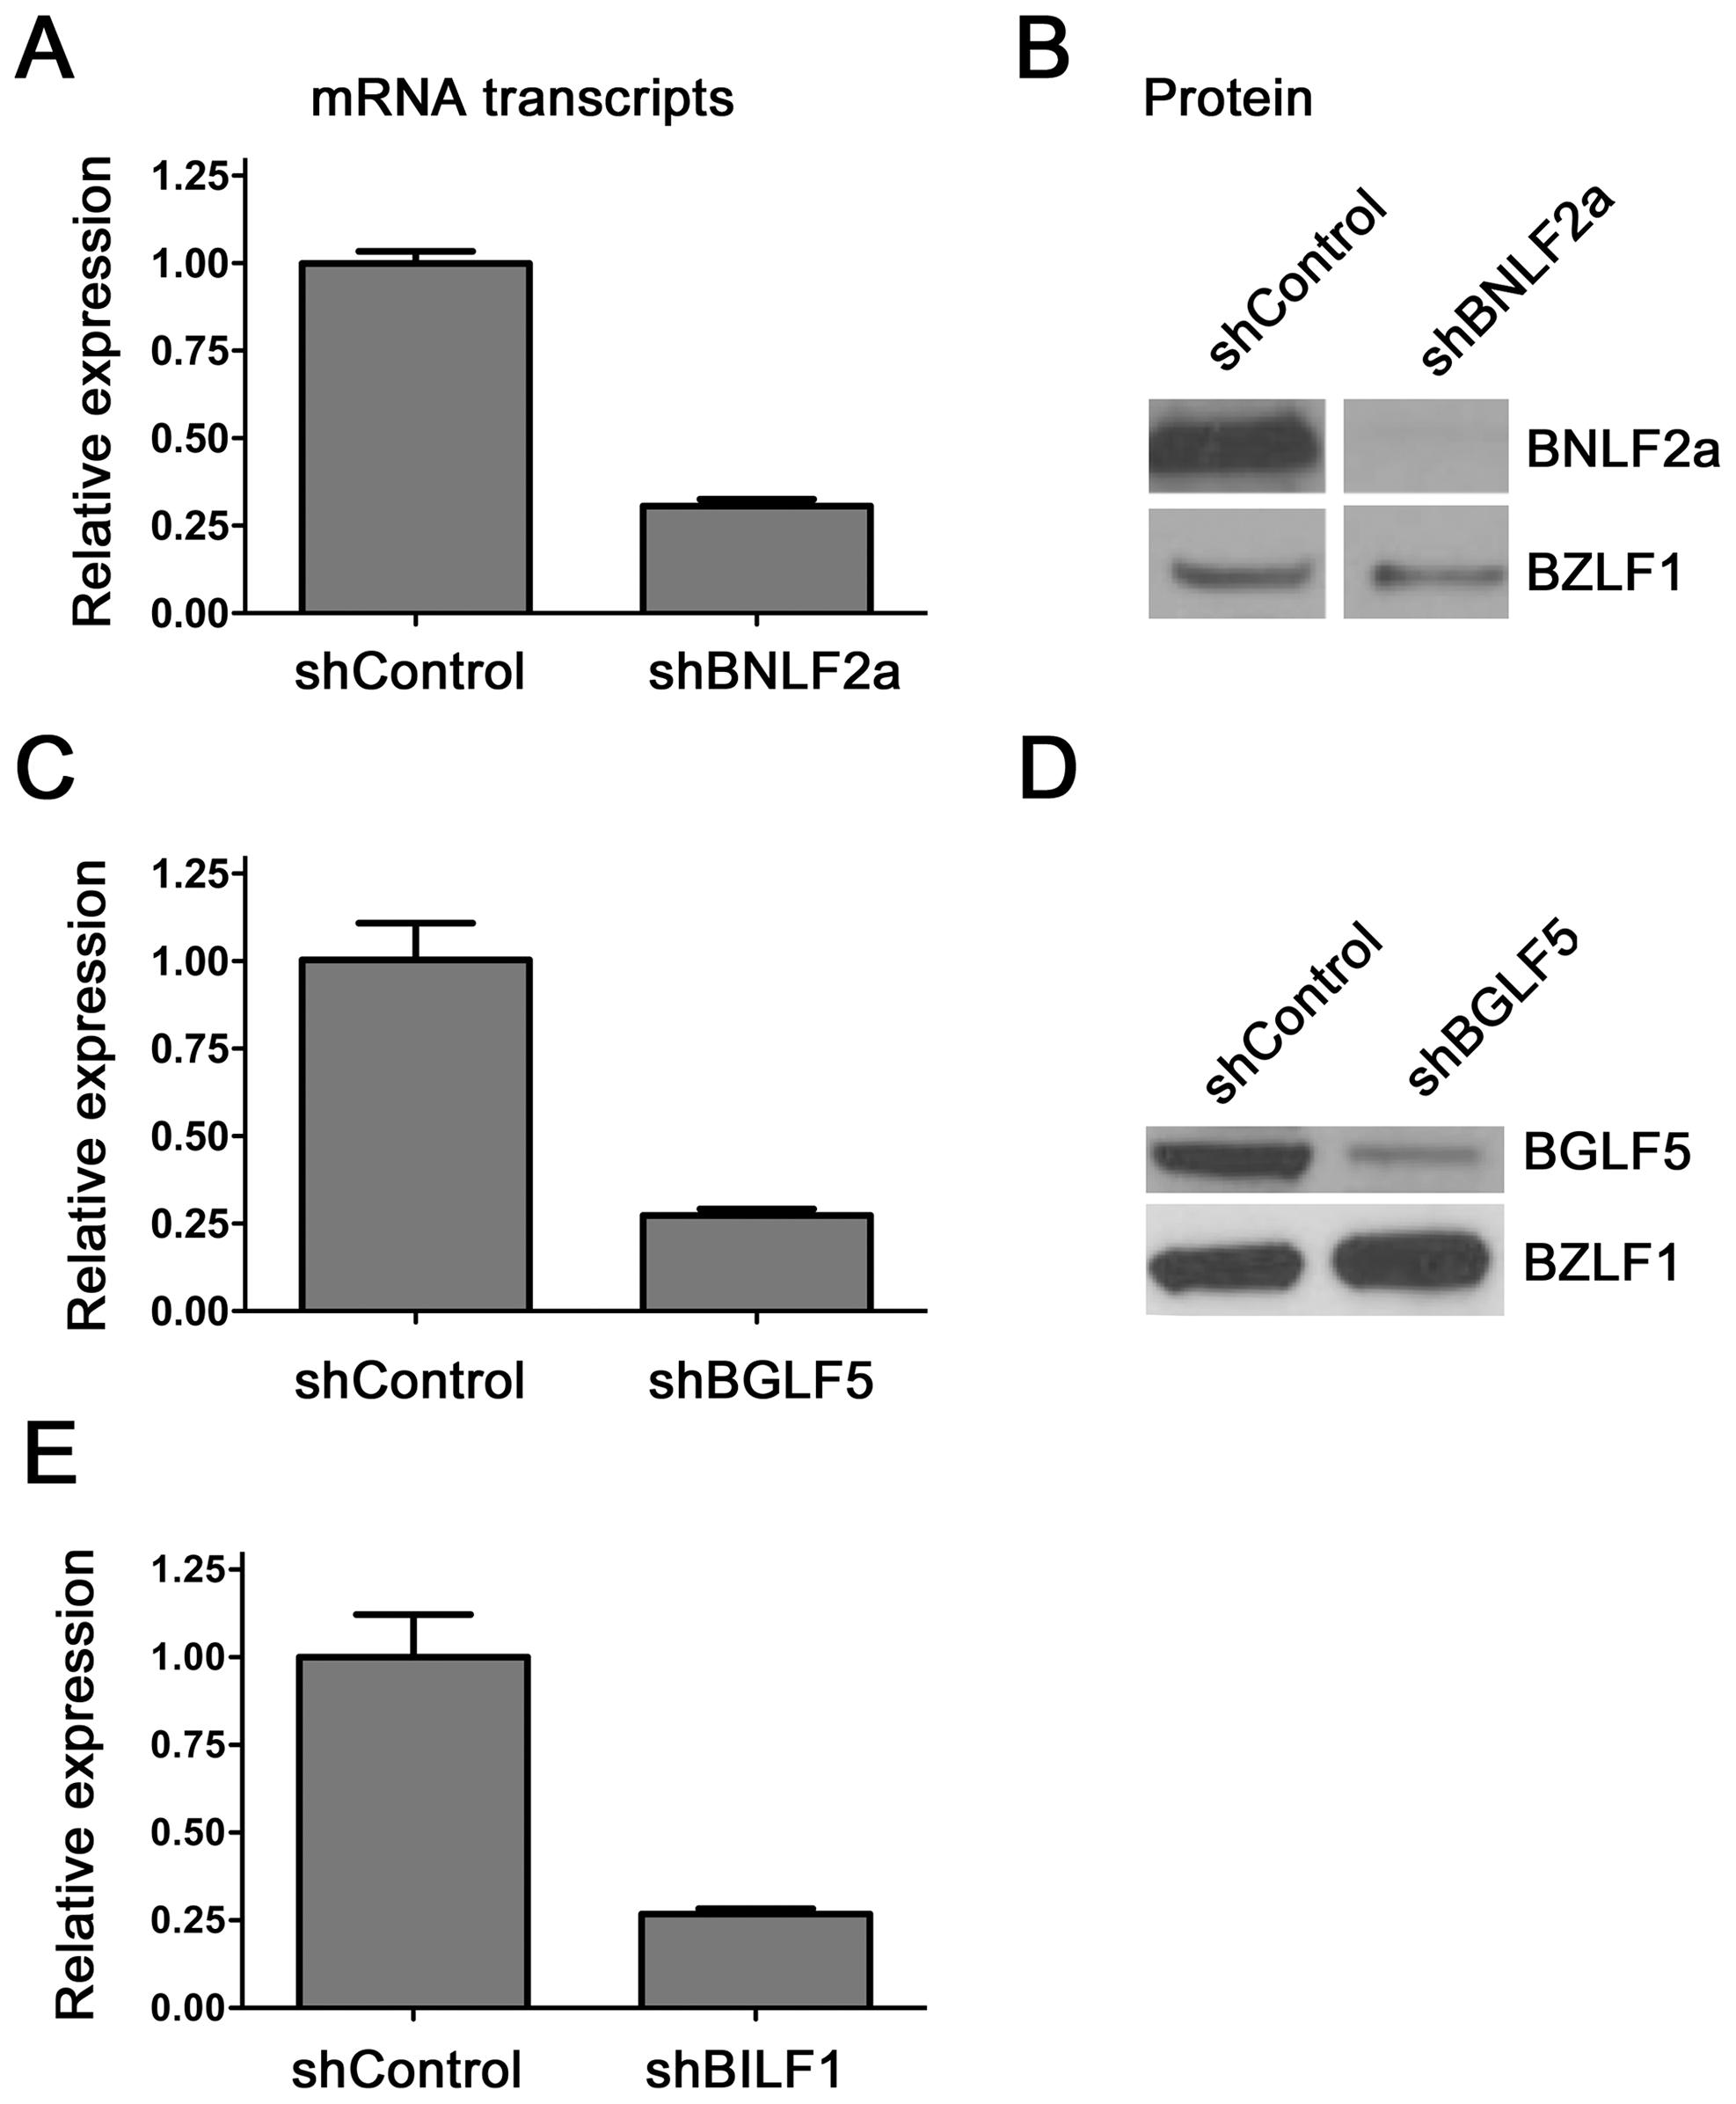 Knockdown of BNL2a, BILF1 and BGLF5 in transduced LCLs.